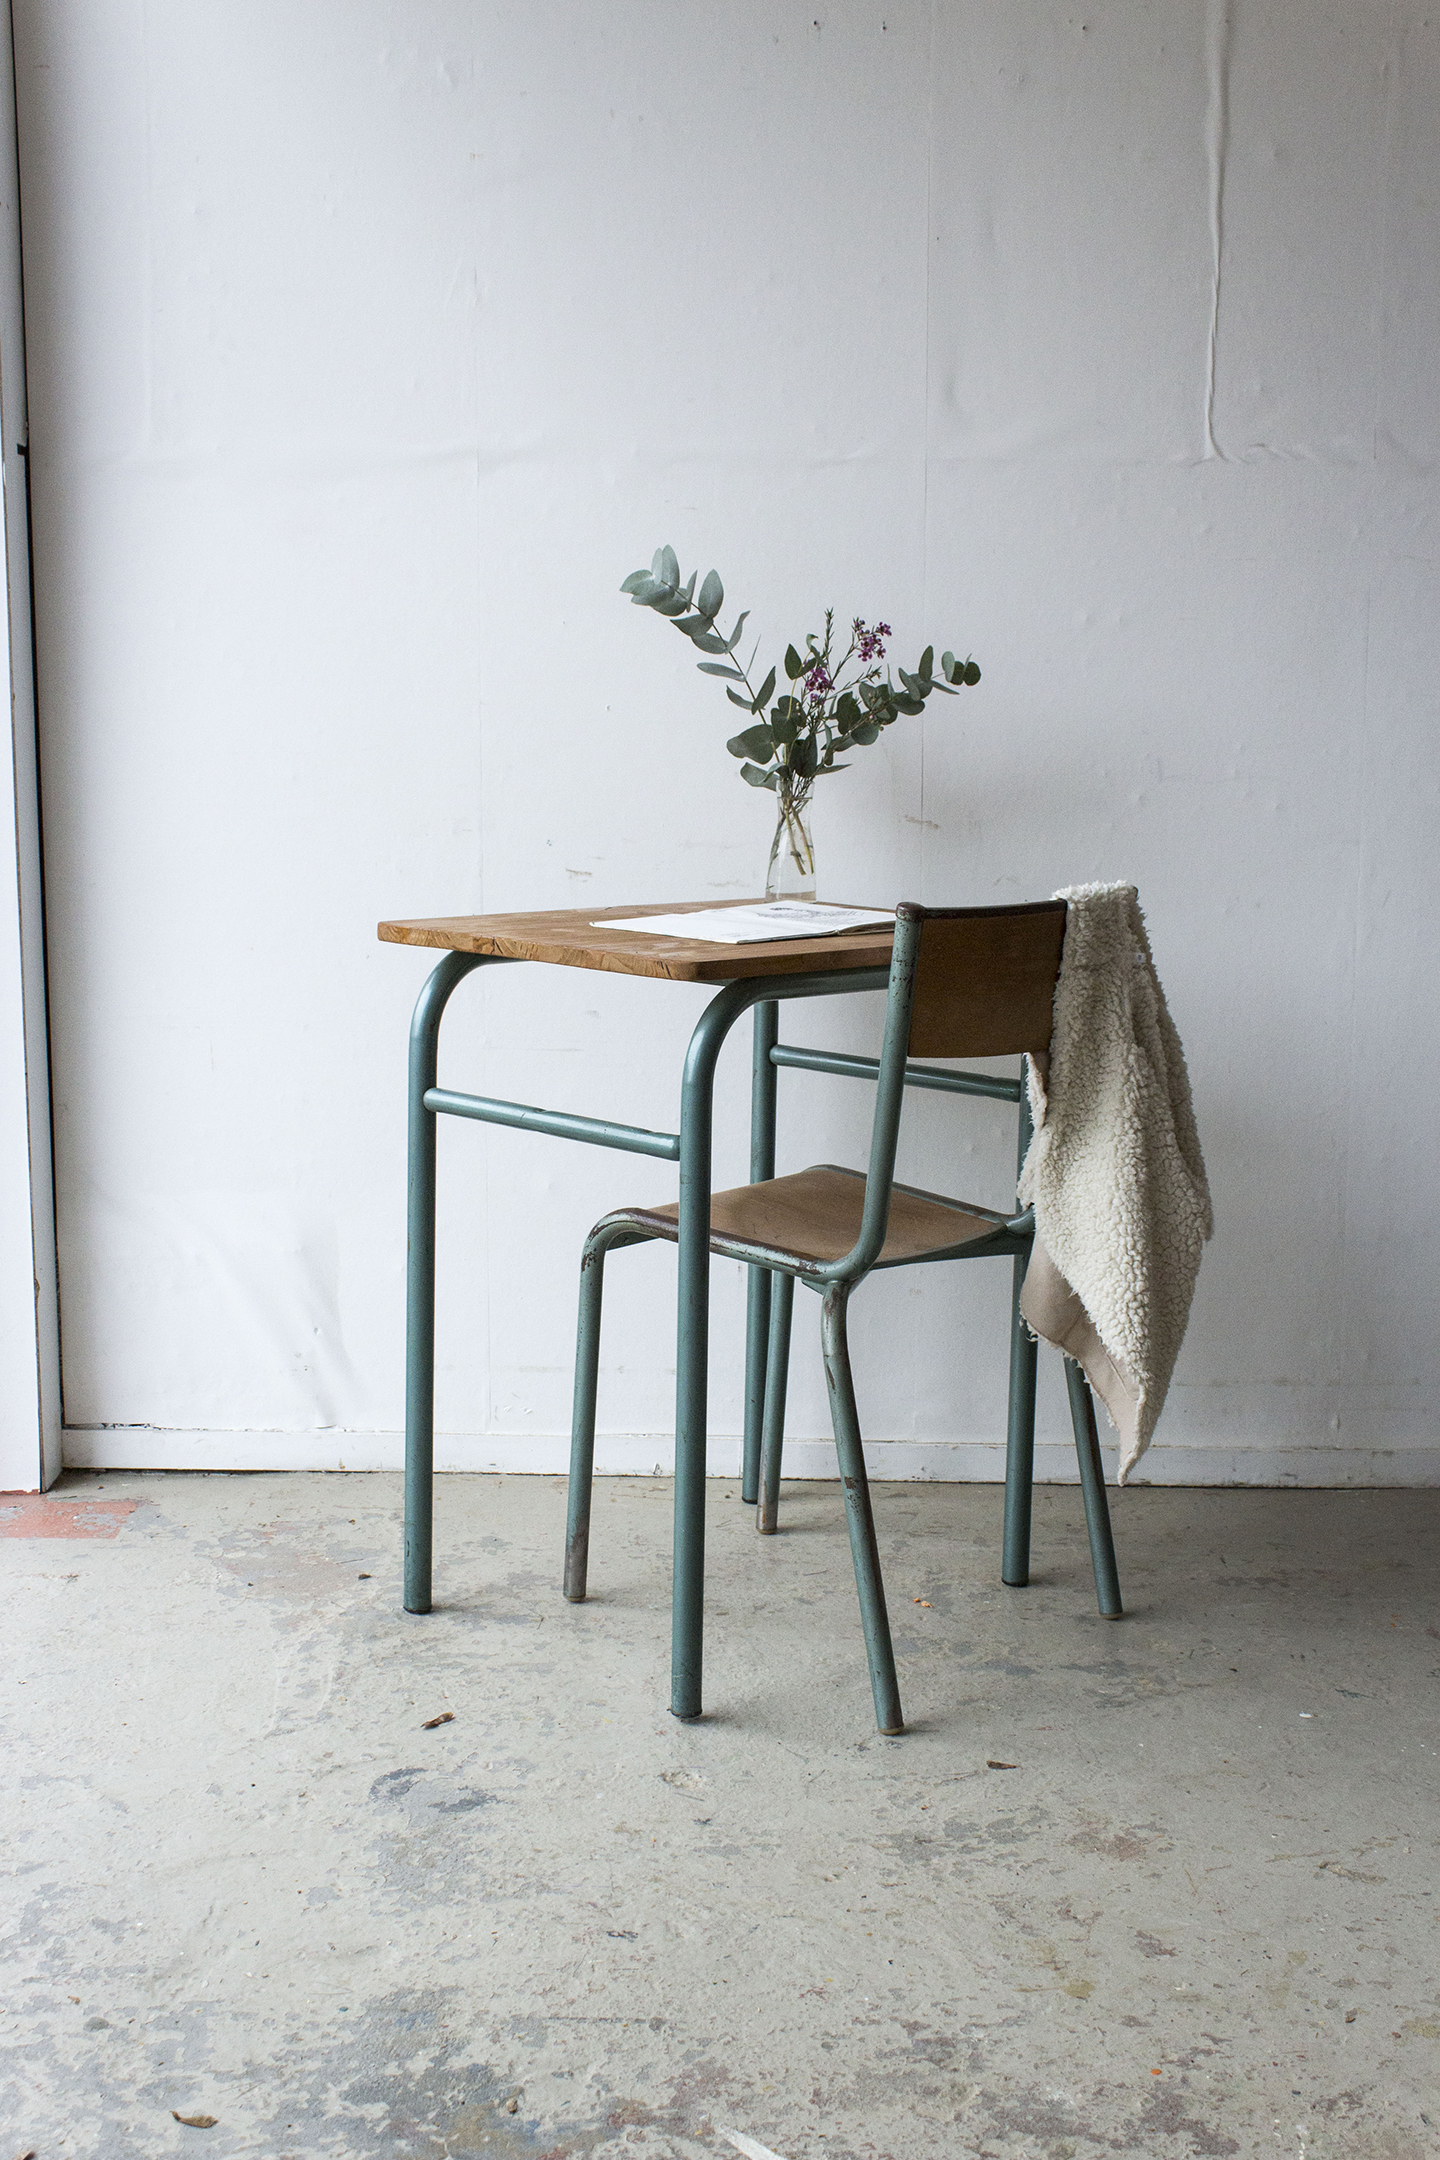 3176 - 1p vintage schooltafel met groen frame - Firma zoethout.jpg